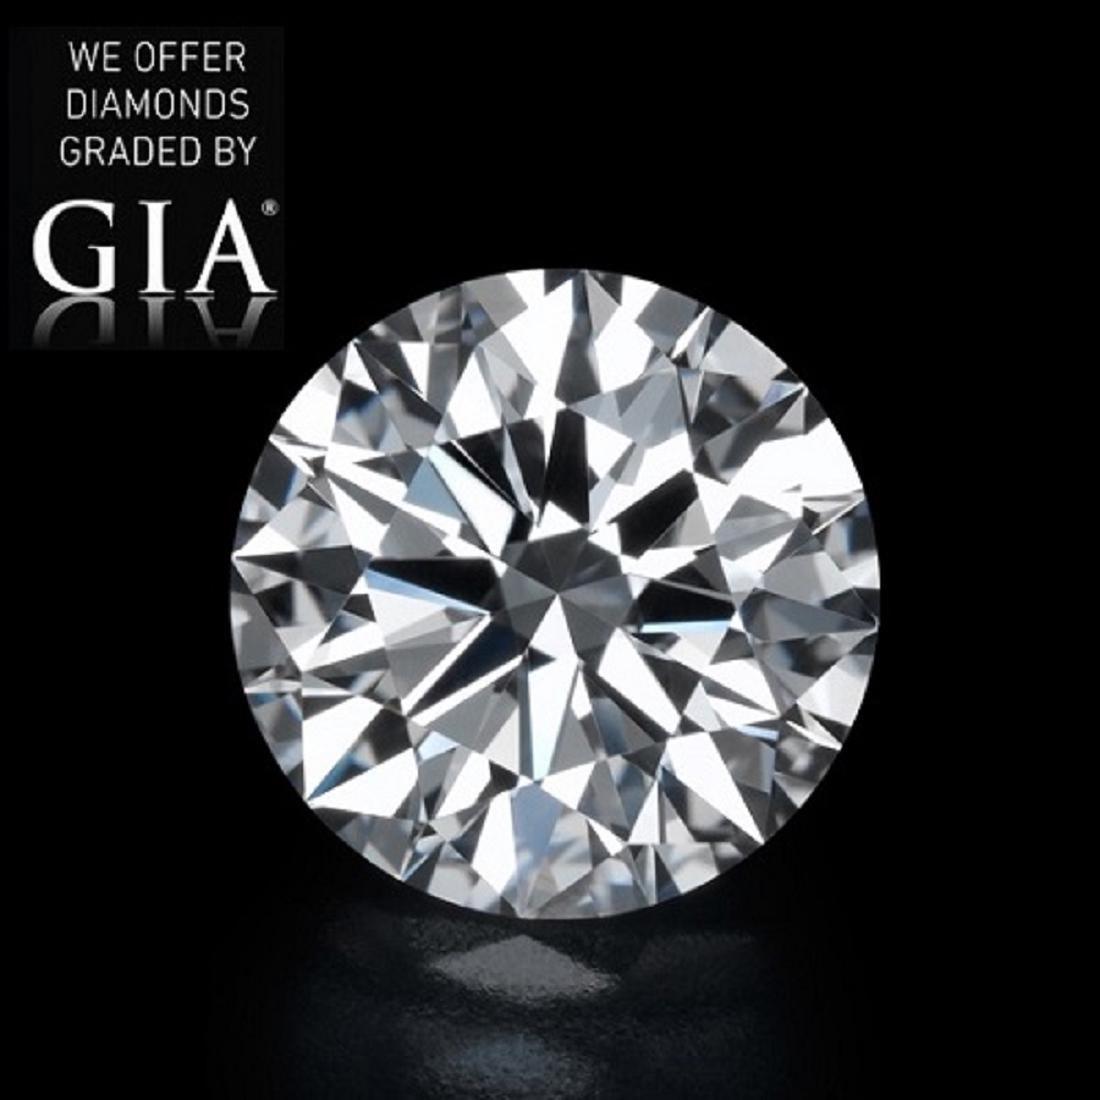 5.02 ct, Color I/VVS2, Round cut Diamond